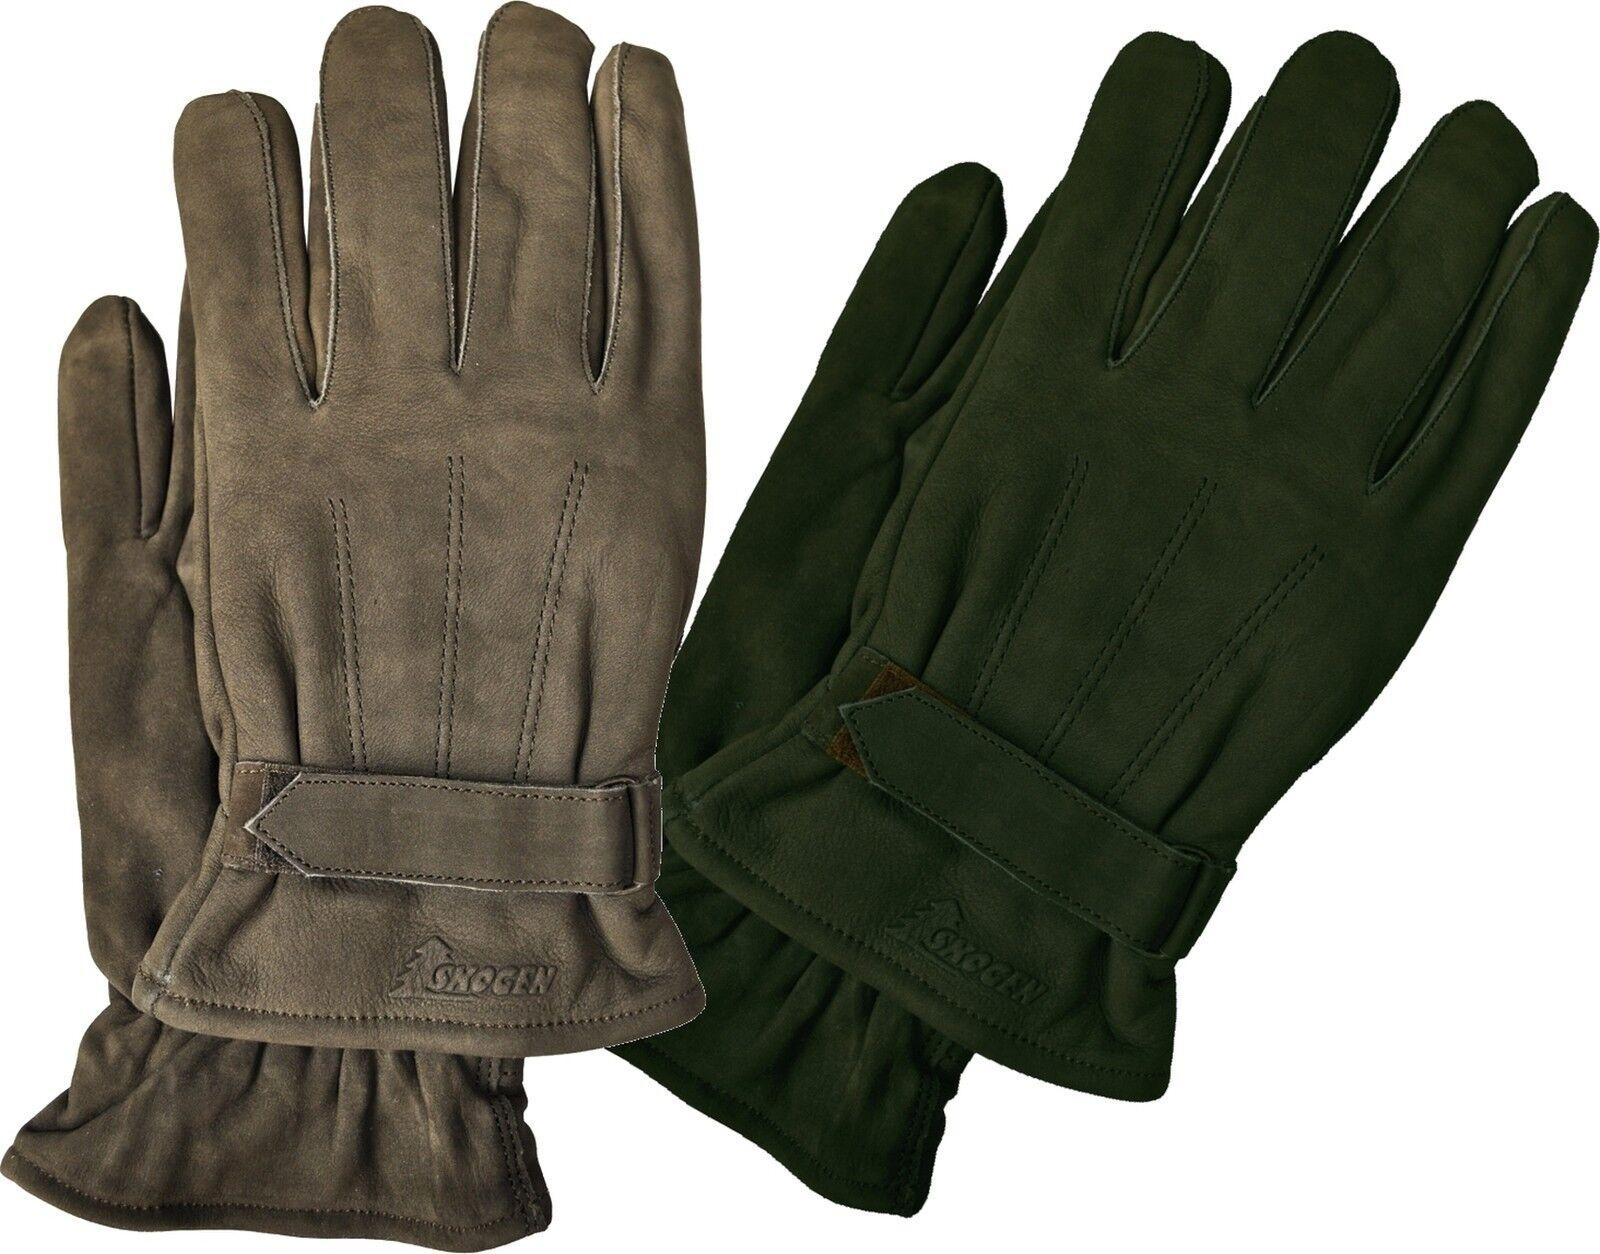 Lederhandschuhe Handschuhe Handschuhe Handschuhe echt Leder gefüttert 100% Leder Thinsulate d2d369